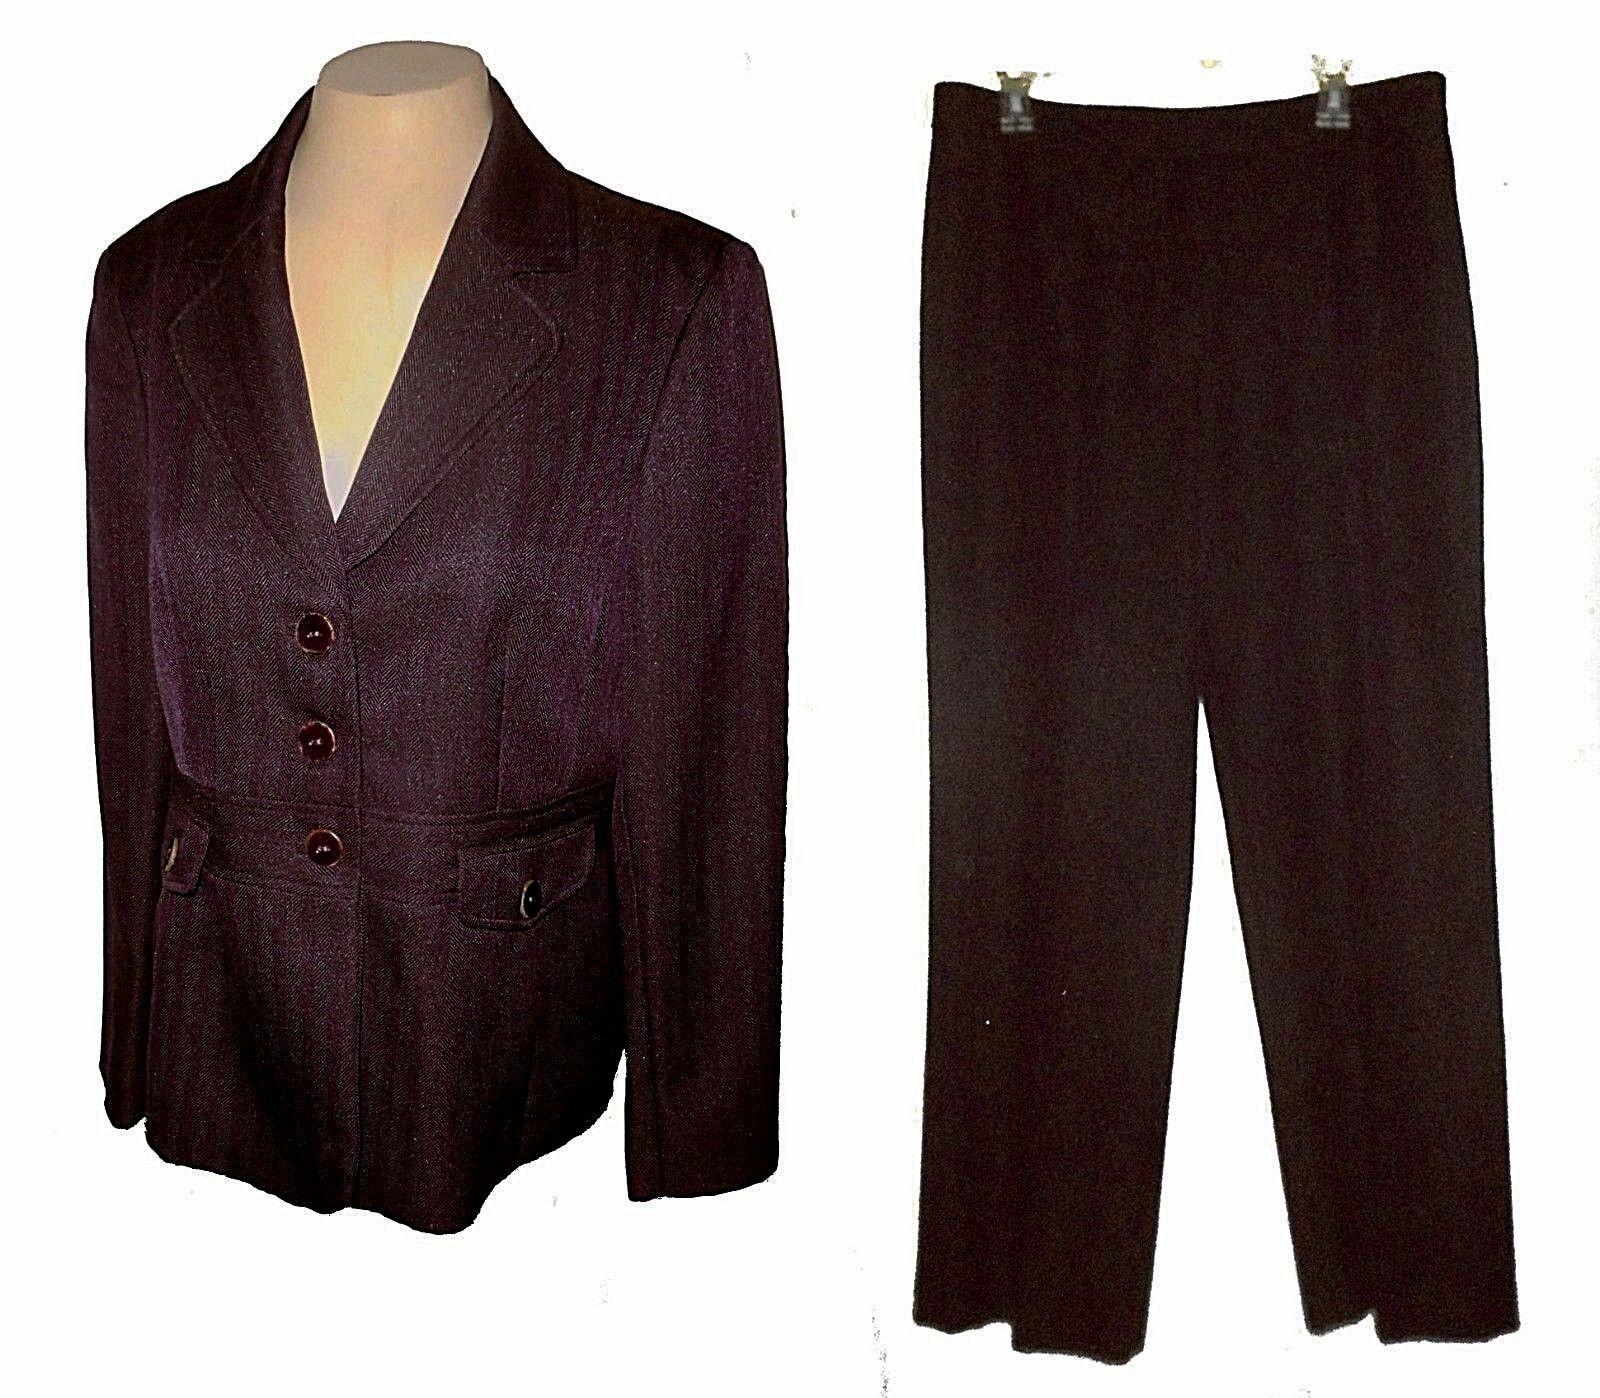 Nouveau 2-PC Costume  Pantalon Blazer, Evan-Picone, tweed lila Western Business 12